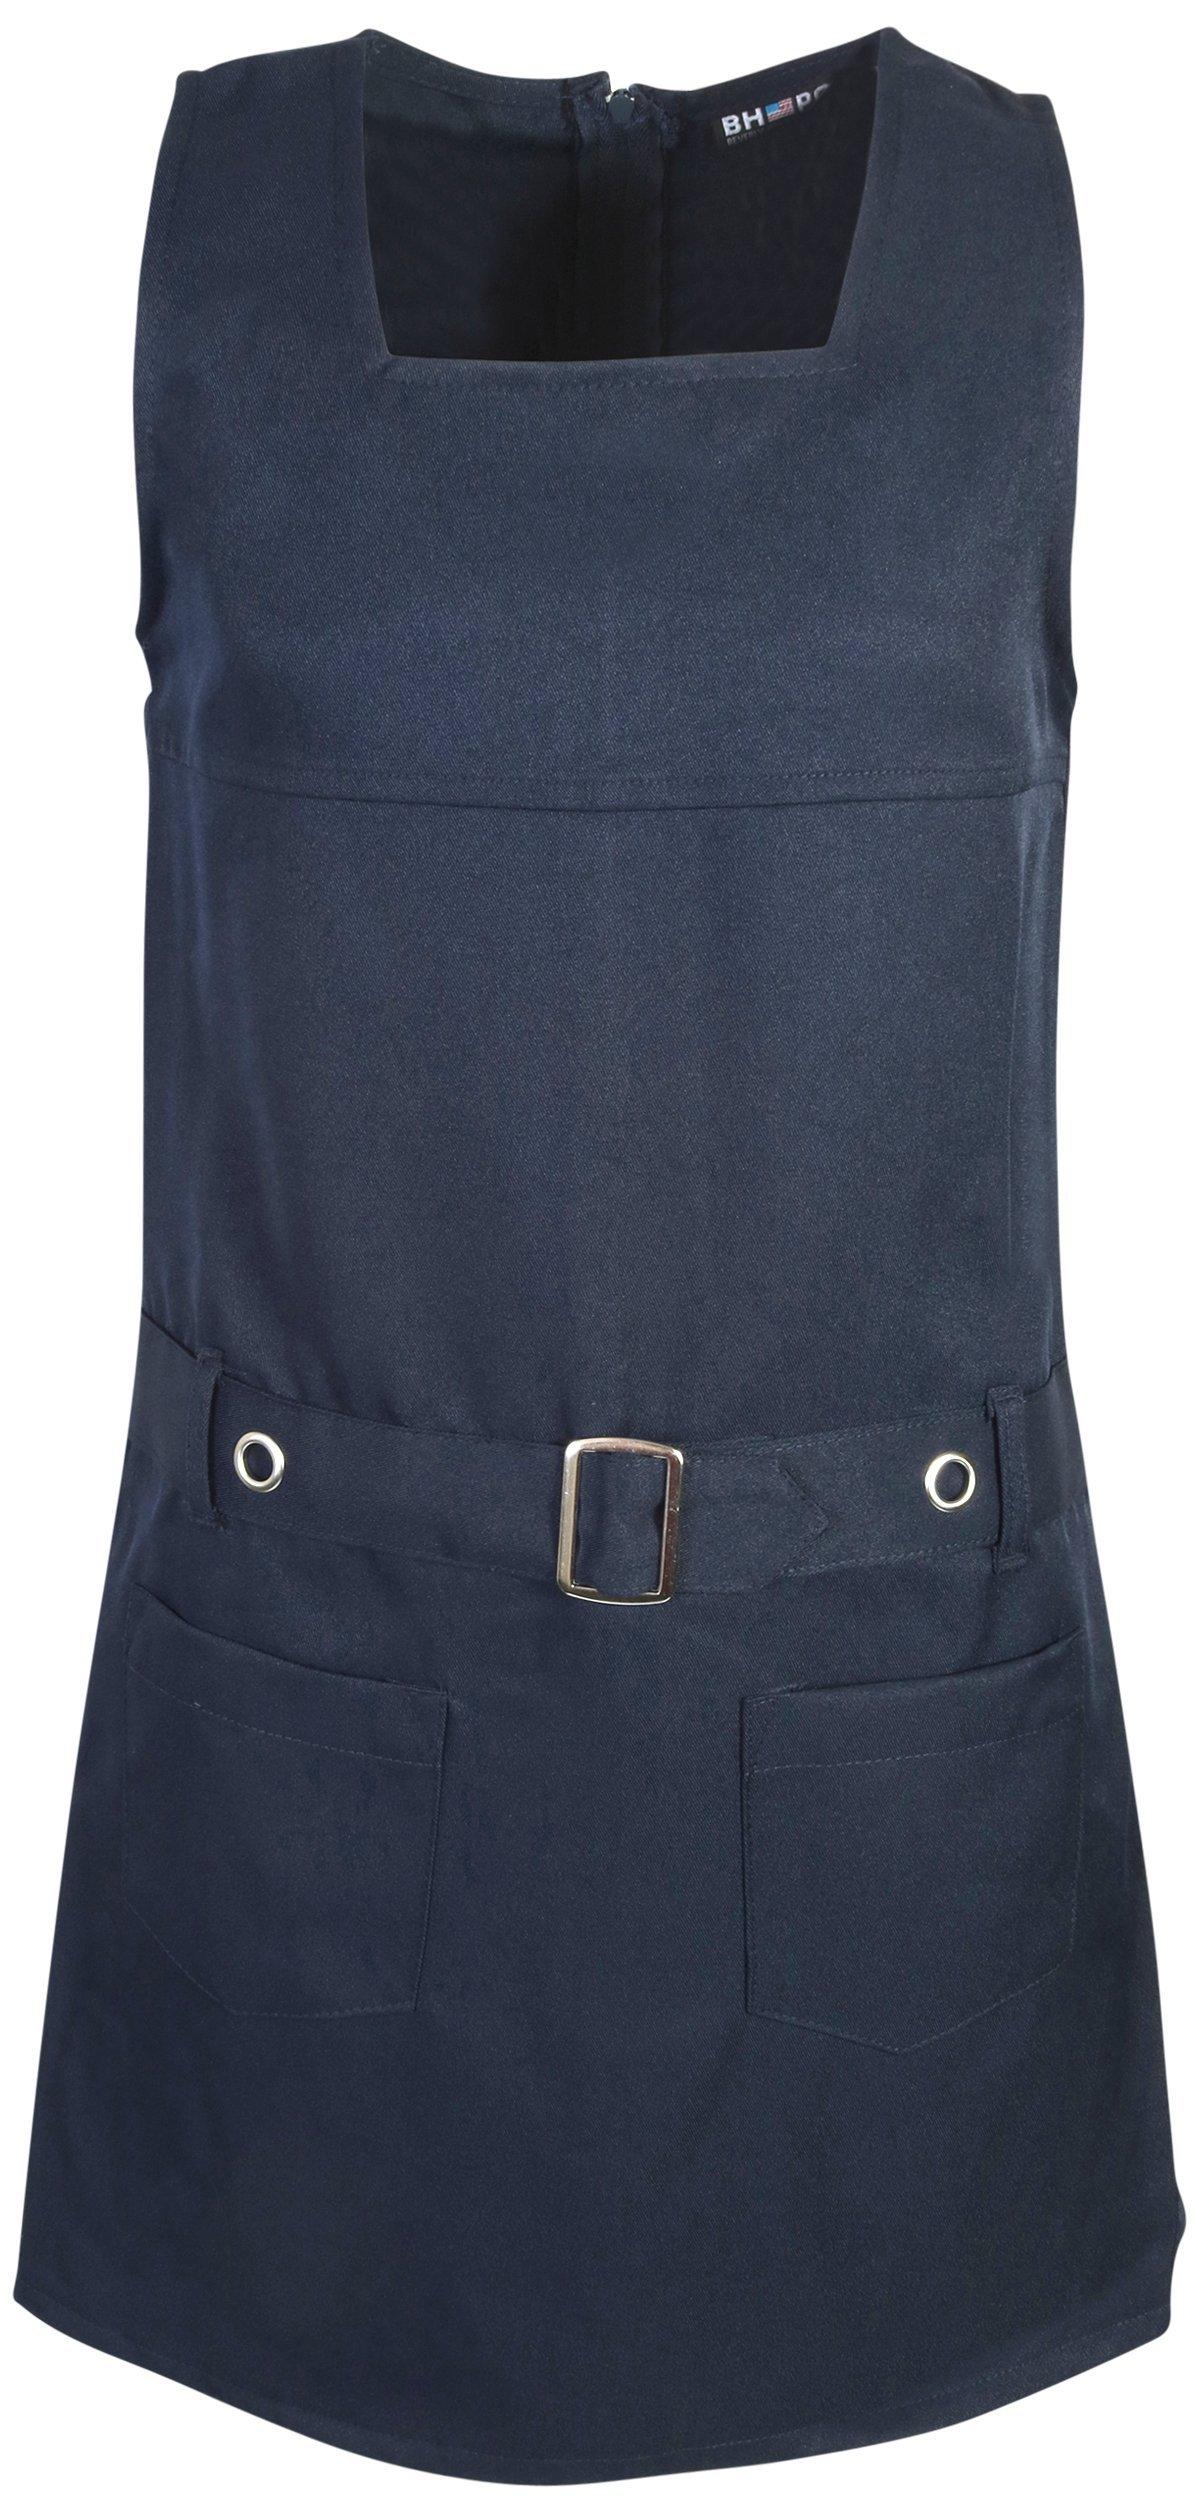 Beverly Hills Polo Club Girls School Uniform Belted Twill Jumper, Navy, Size 7'